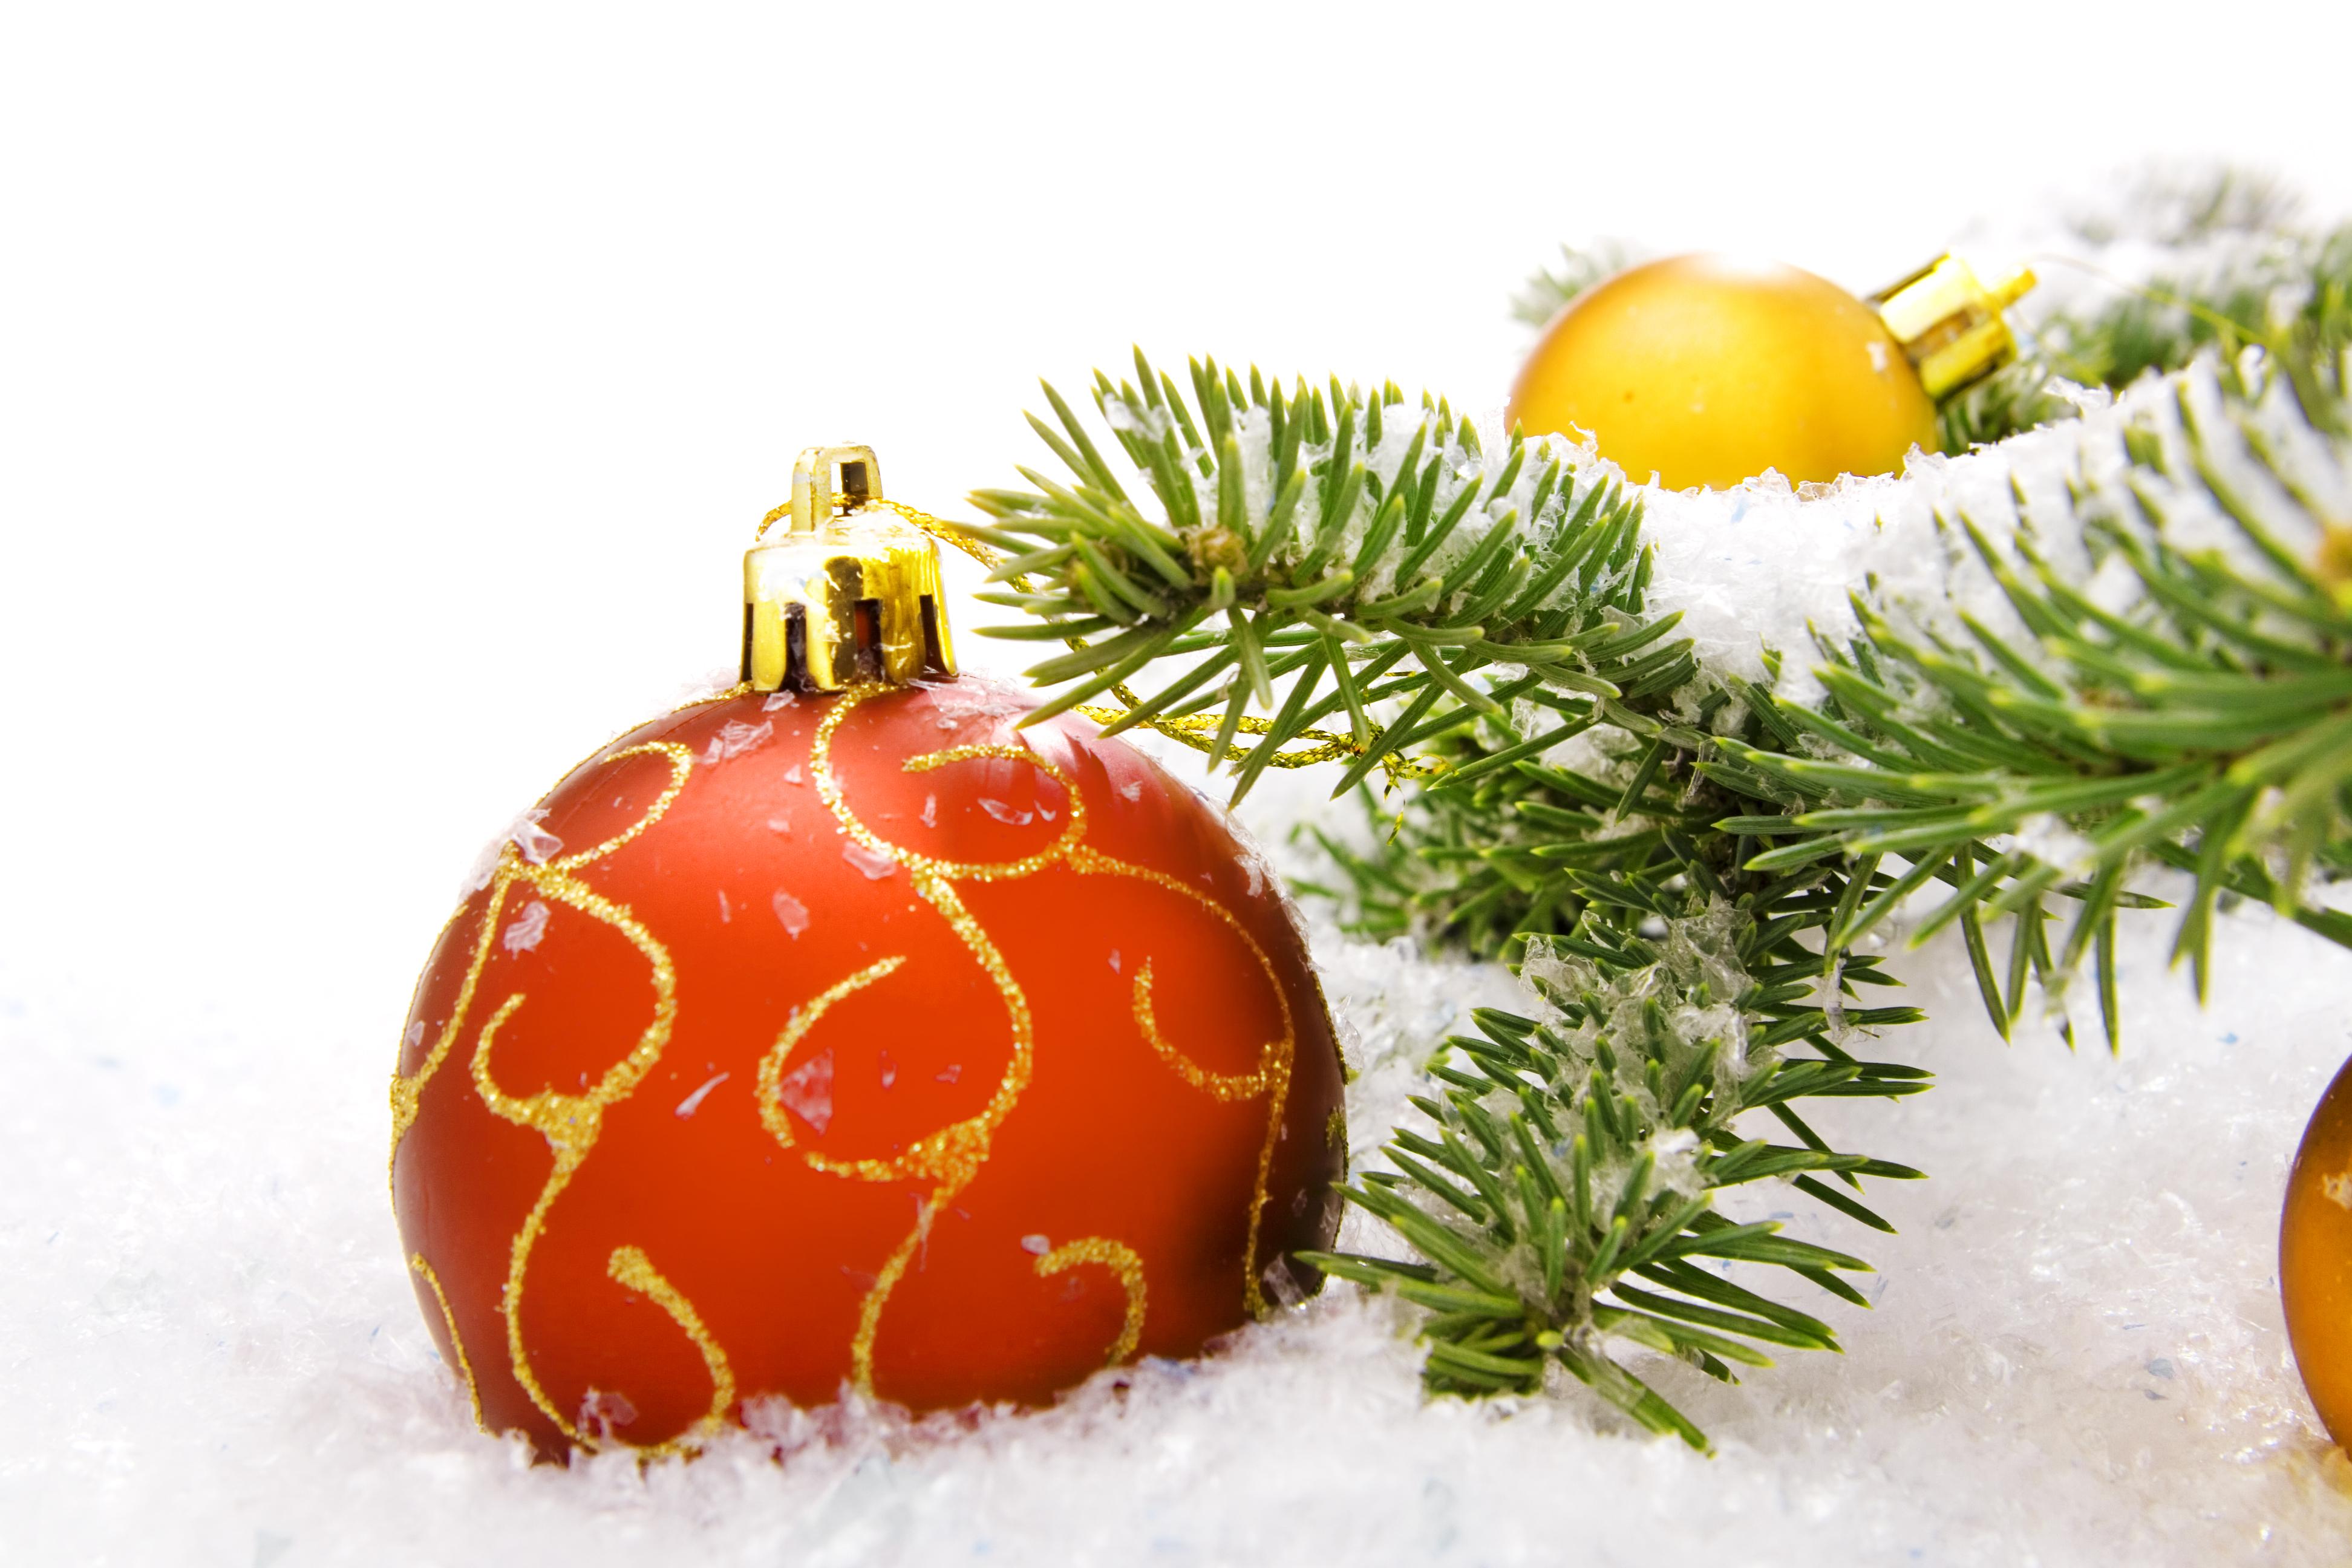 Christmas decoration, Ball, Bauble, Celebration, Christmas, HQ Photo